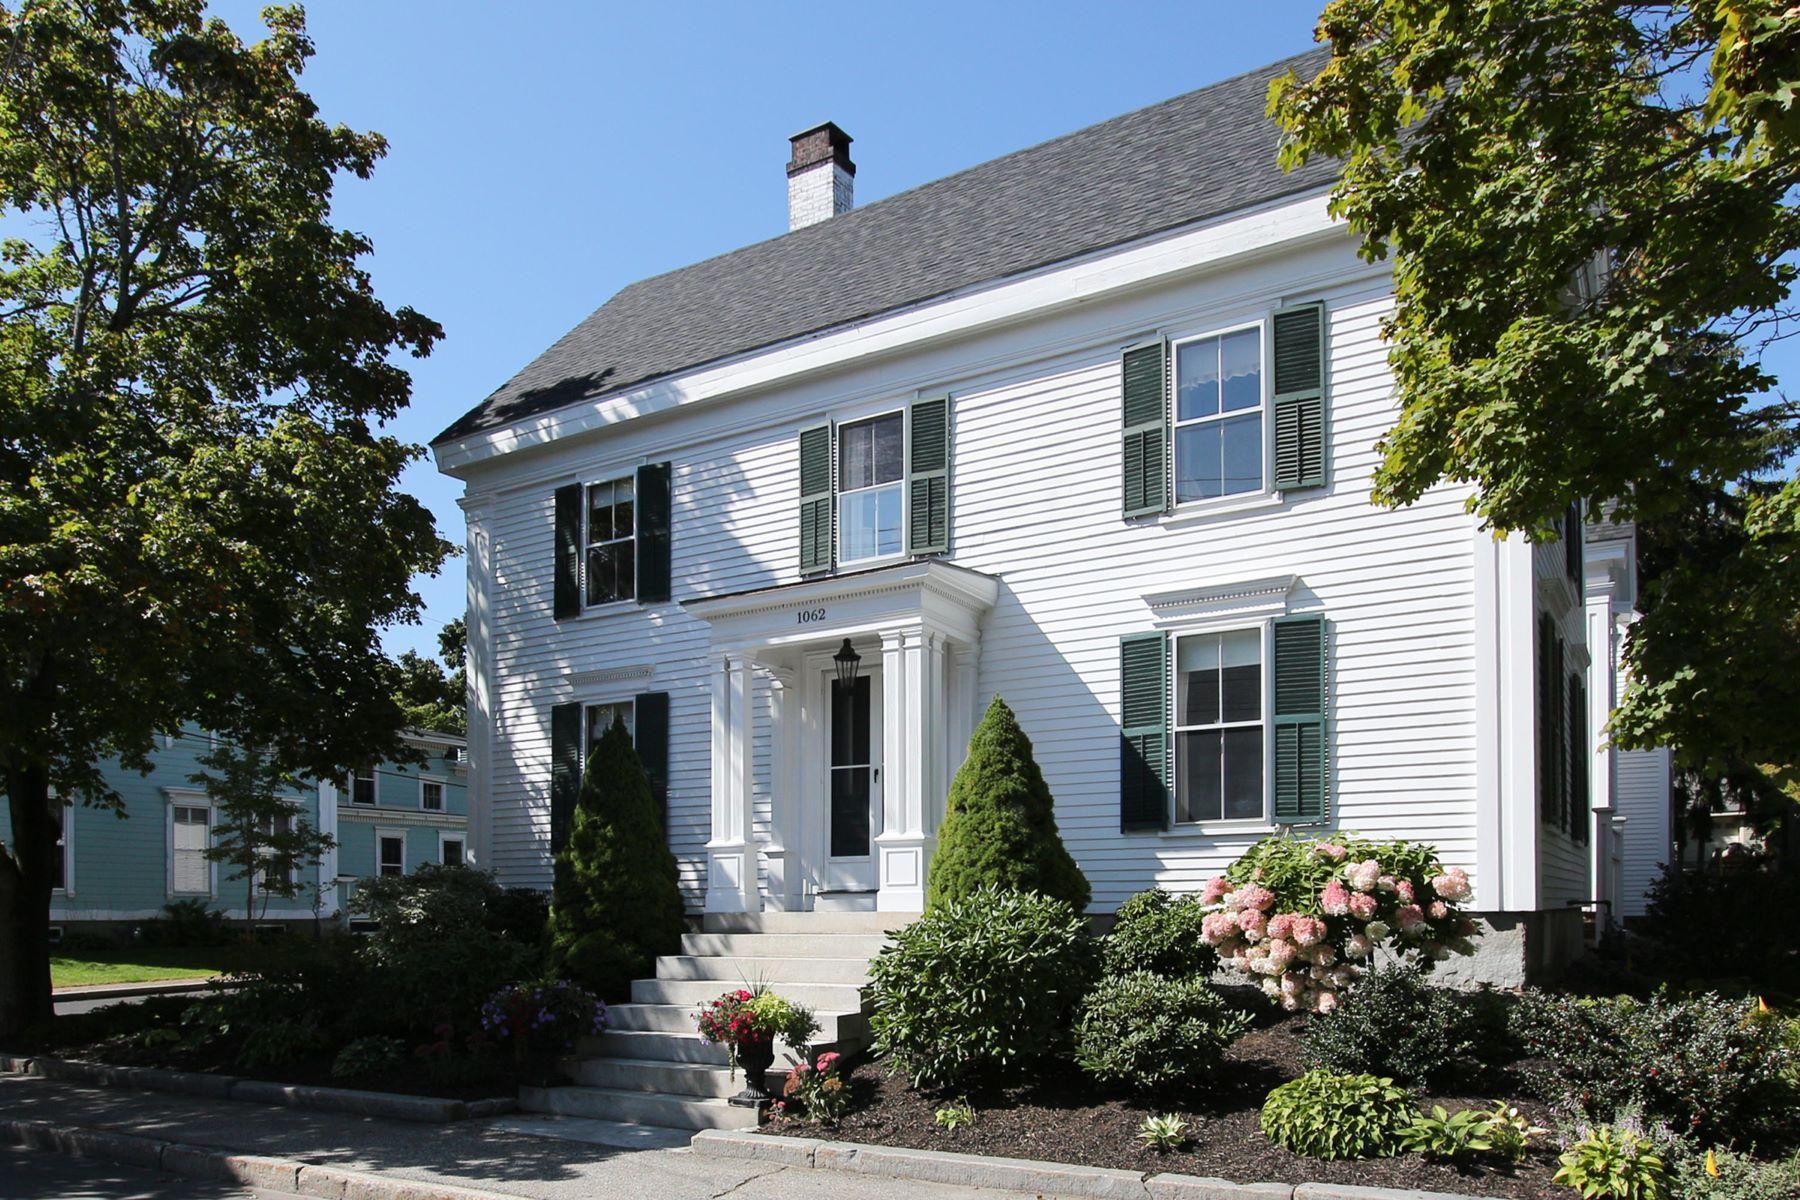 Single Family Homes for Sale at 1062 Washington Street Bath, Maine 04530 United States